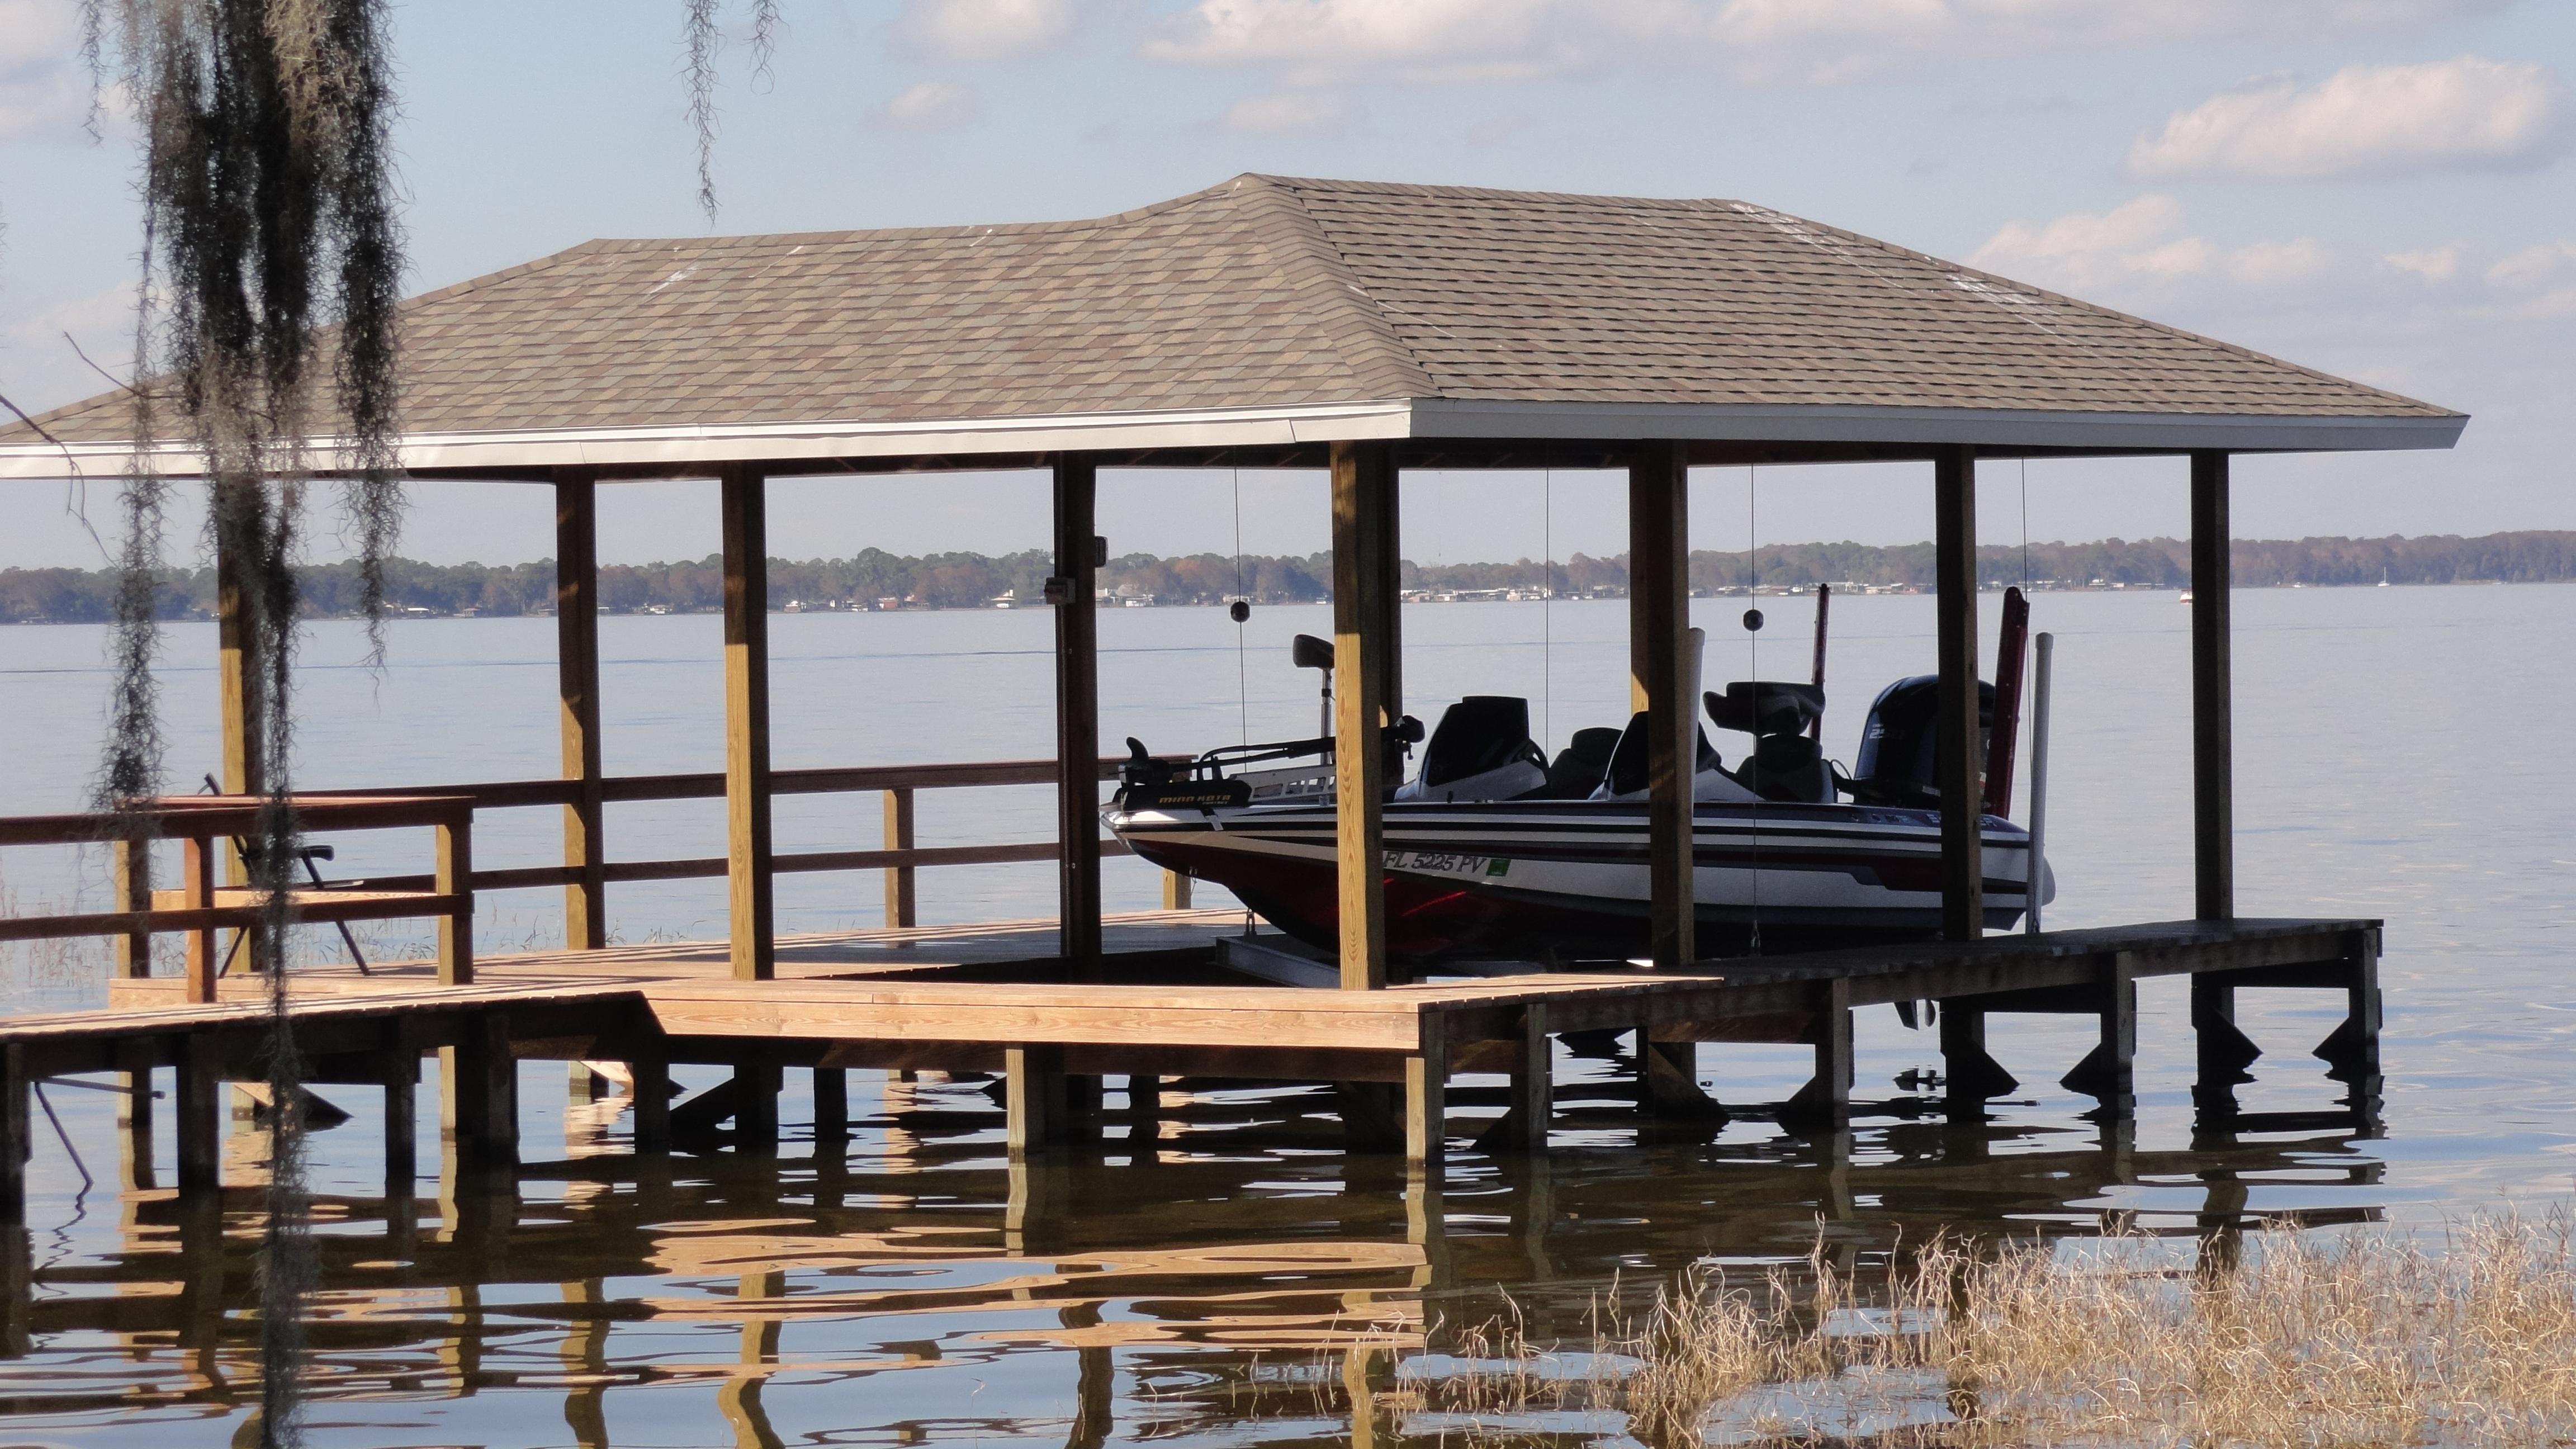 Table Water Wood Boat Lake Pier Transportation Cottage Gazebo Port Furniture  Maritime Outdoor Structure Boat Dock